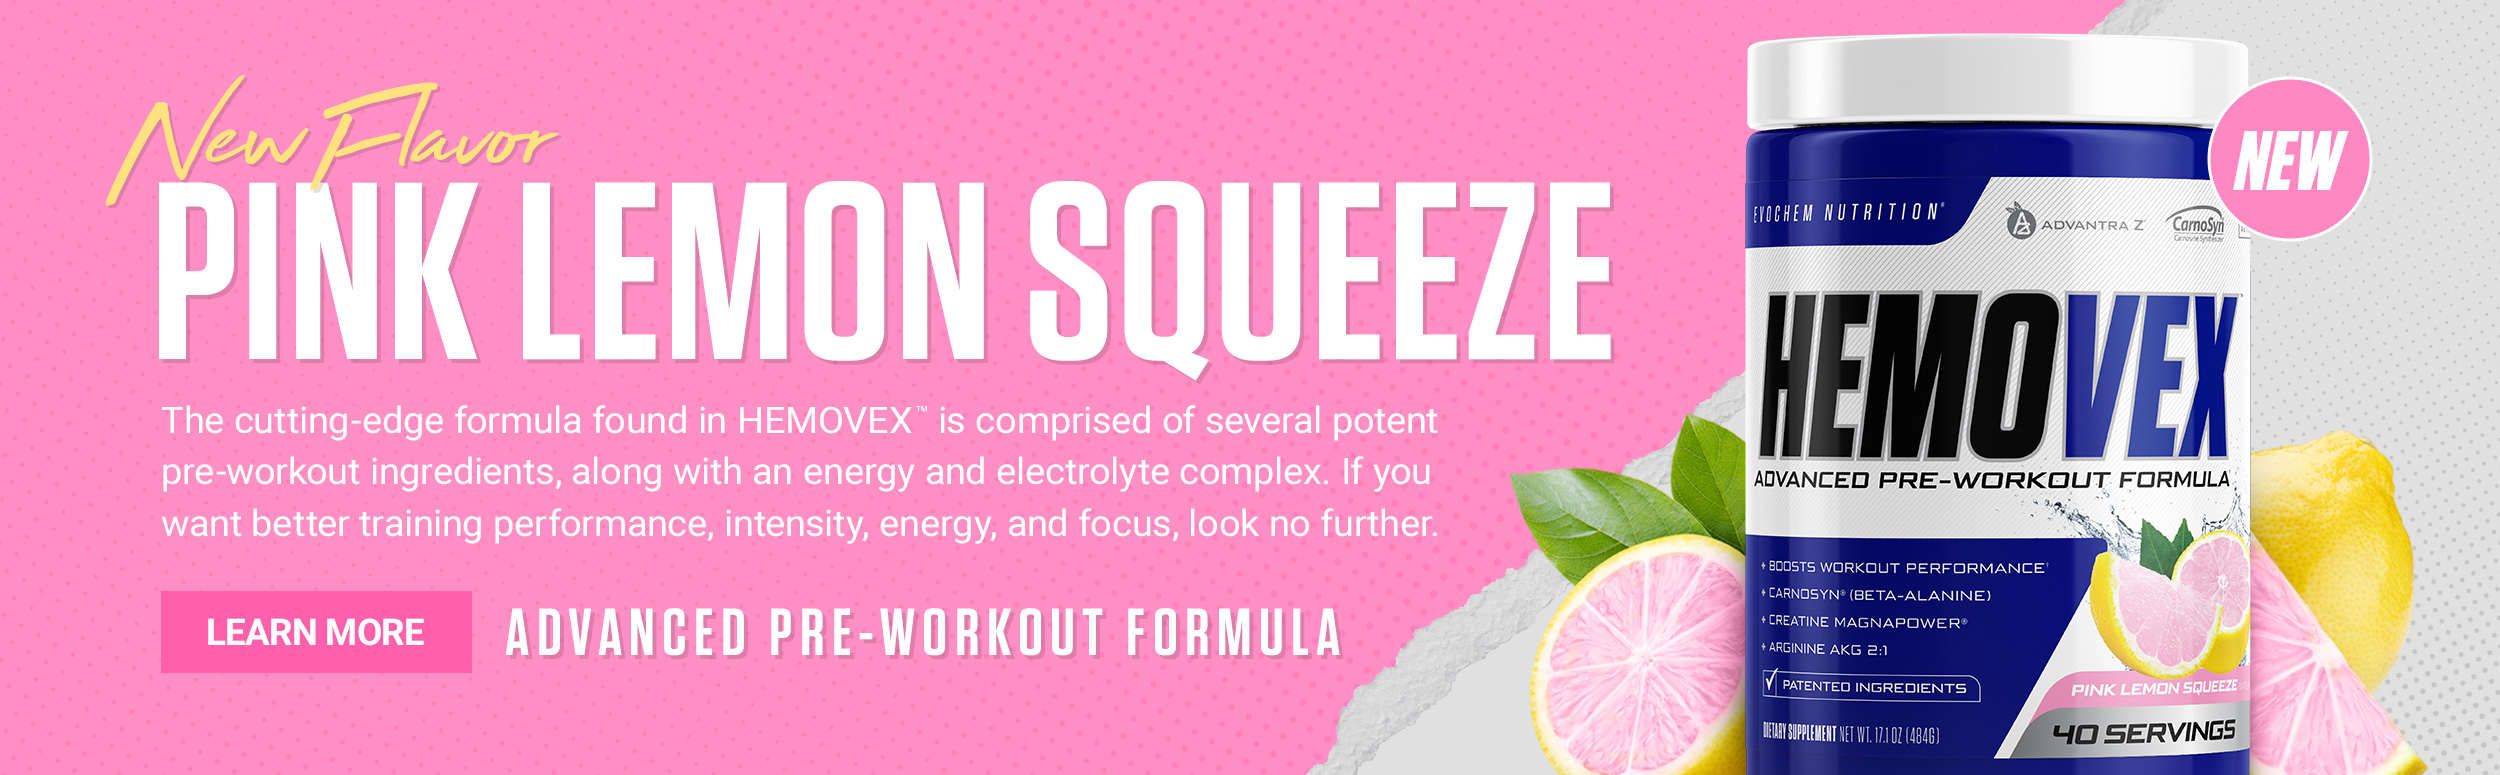 Hemovex Pink Lemon Squeeze